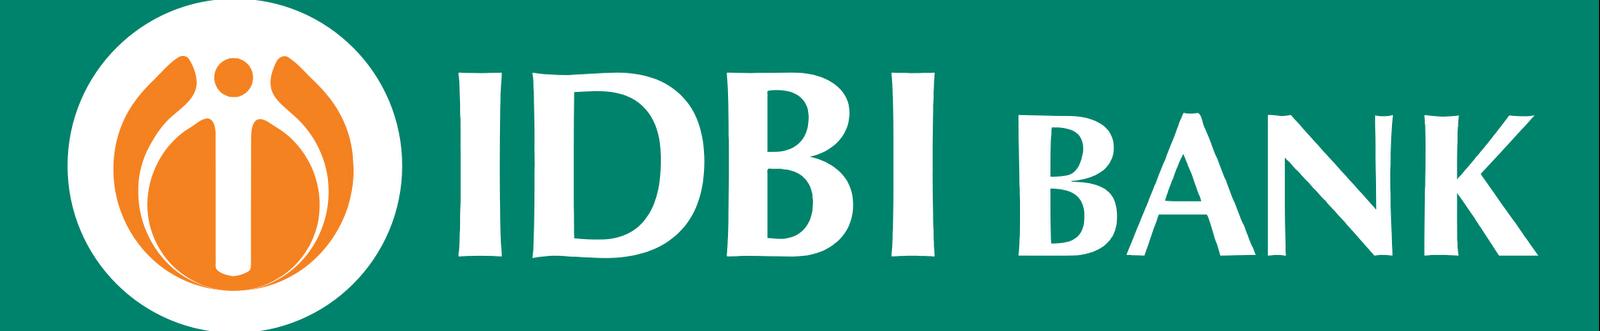 Nationalised Banks Logos And Founder Name Sa Post